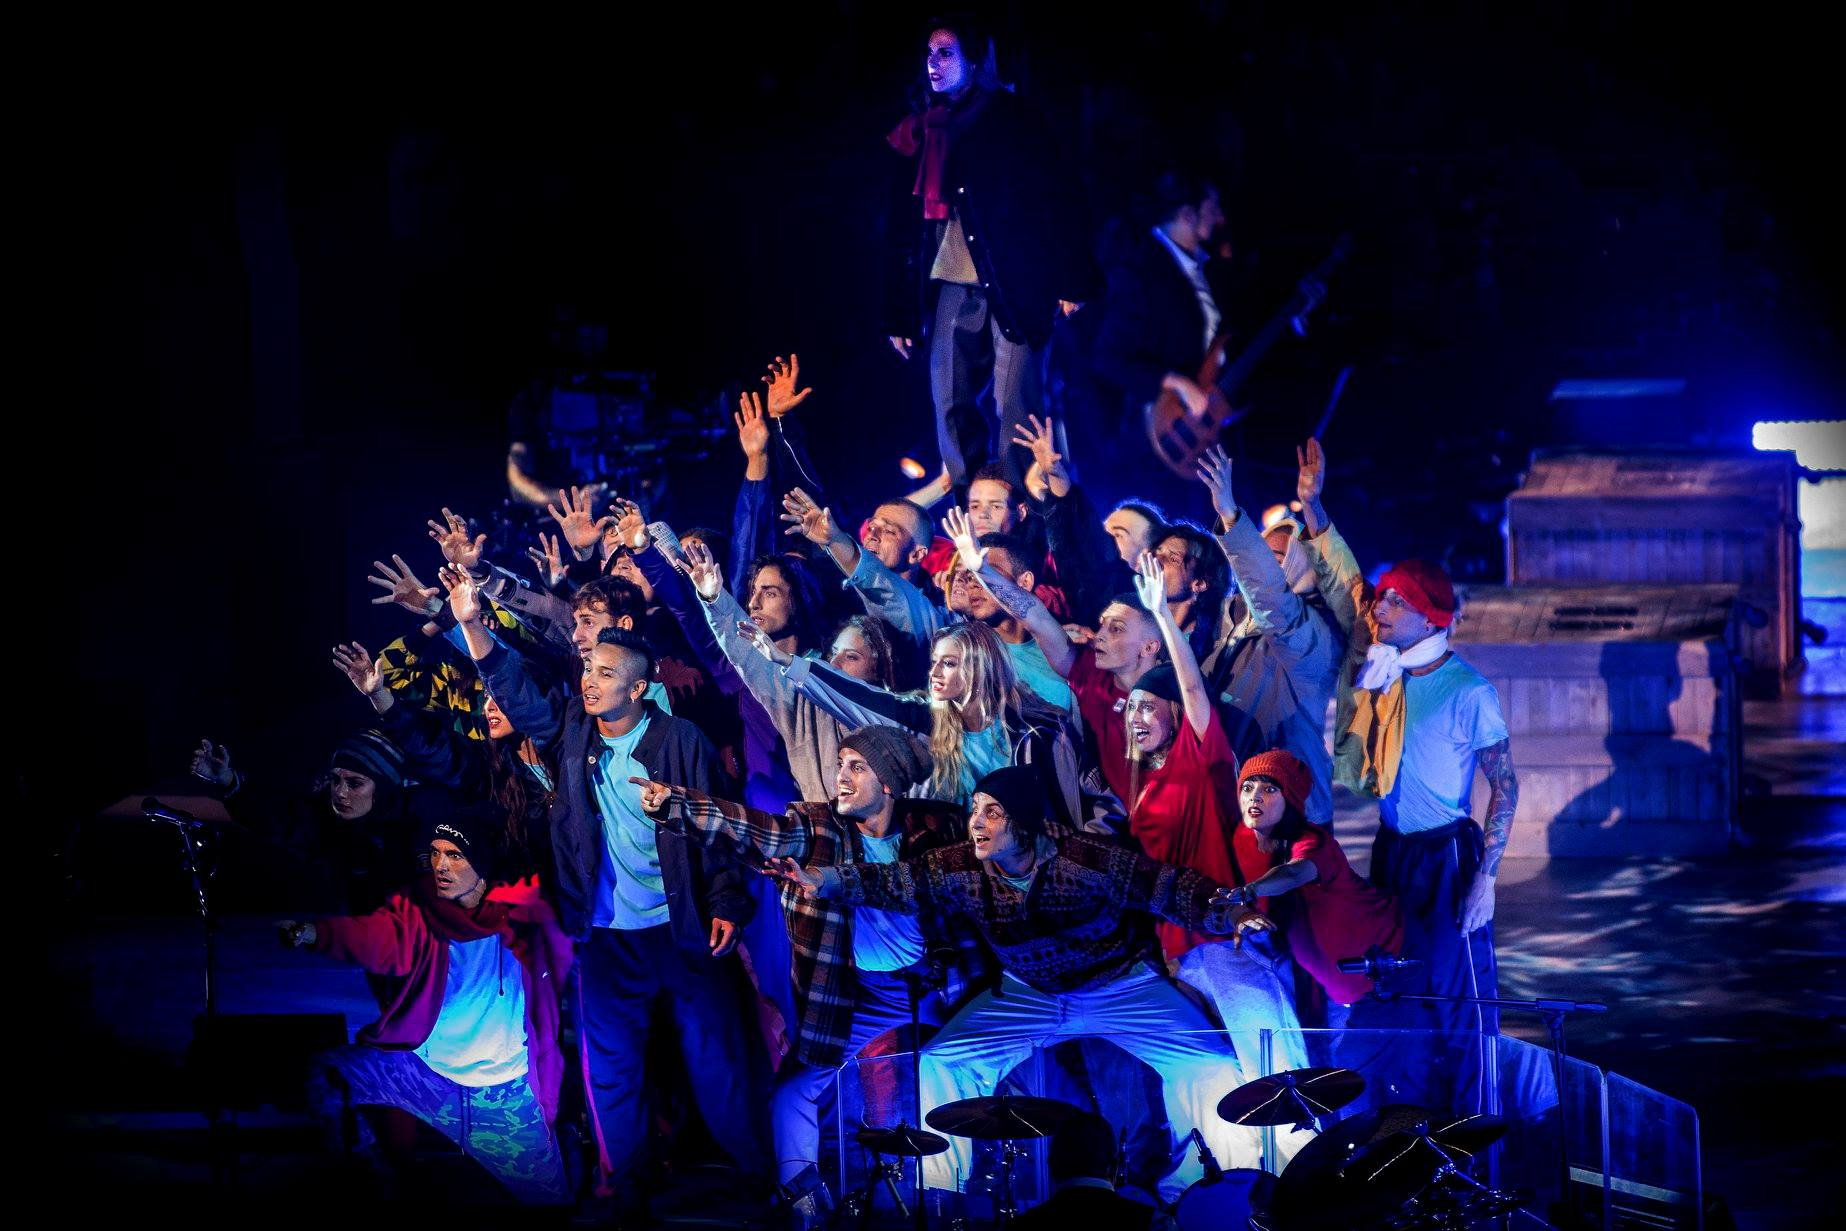 claudio baglioni arena di verona italia italy 50 al centro highline trickline show funambule circus performance spectacle suisse Slackline Lyell Grunberg  (6).jpg